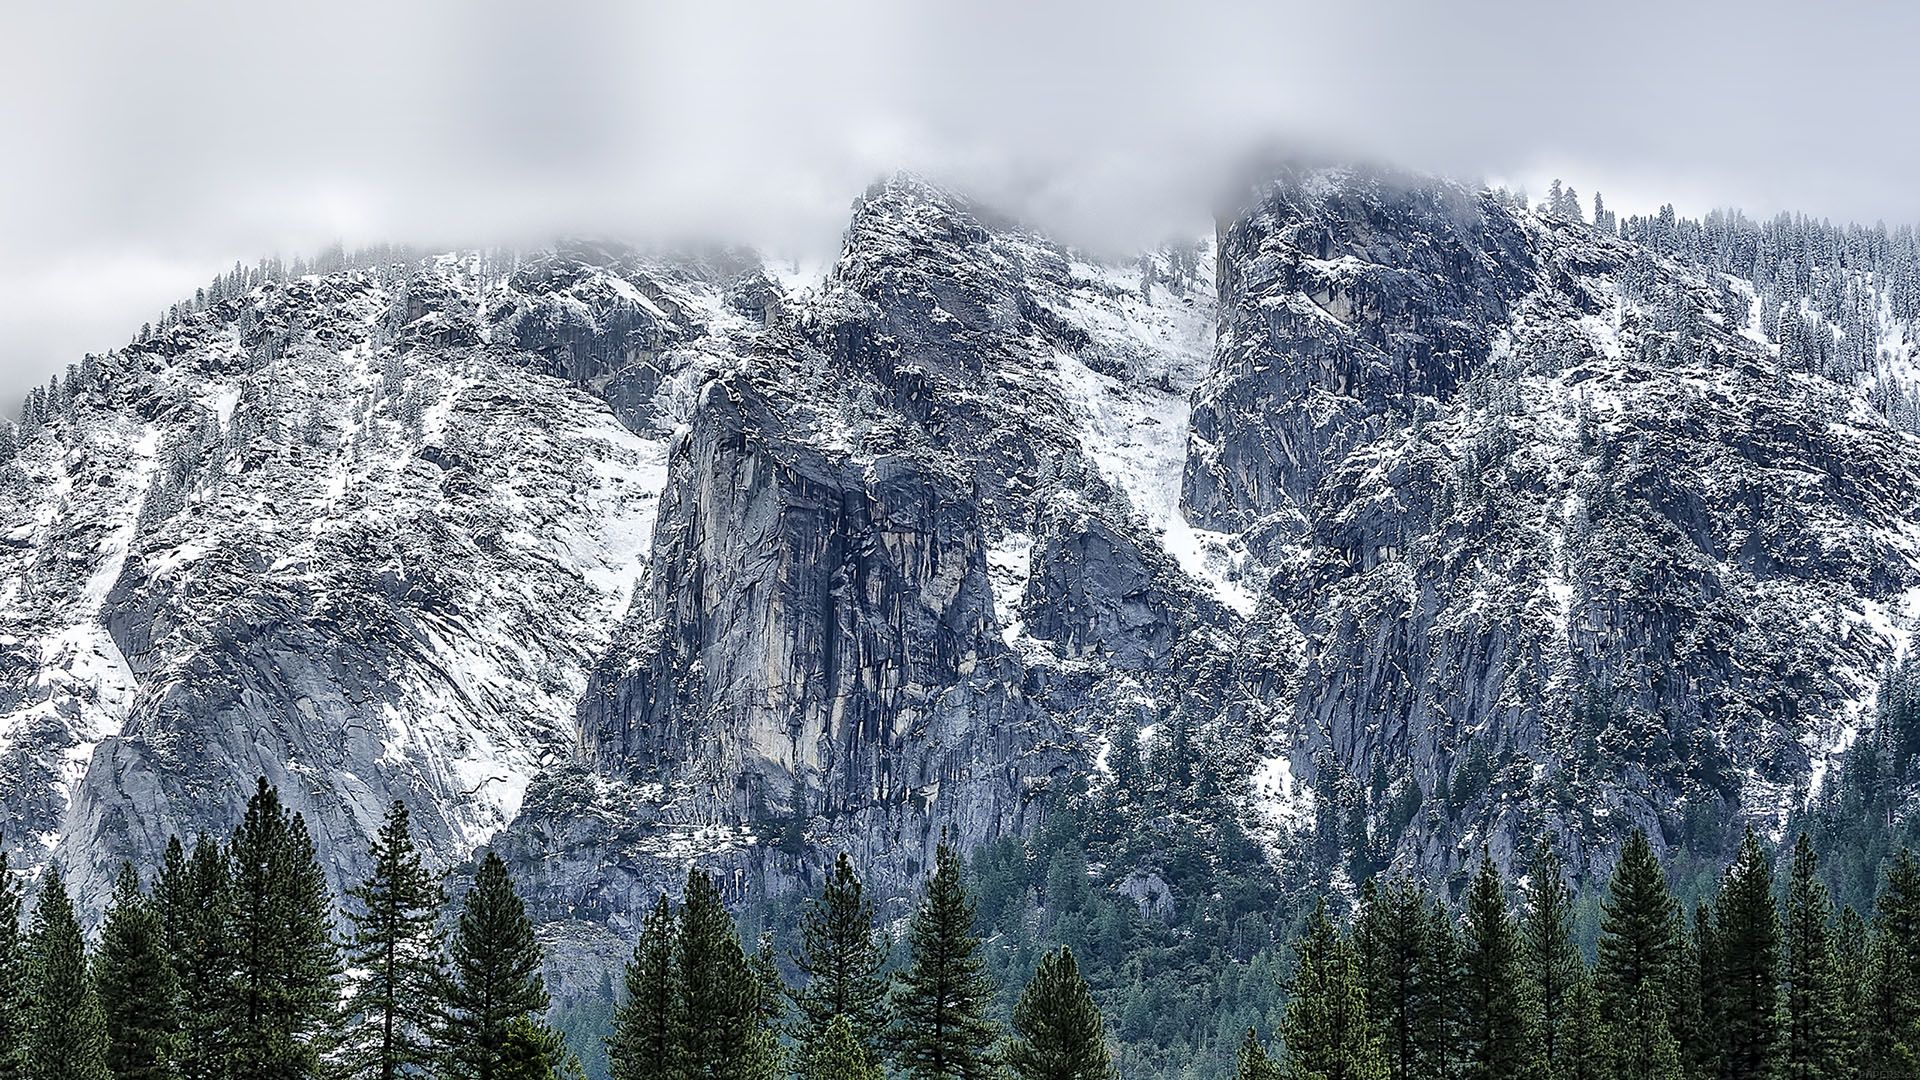 Yosemite Free Desktop Wallpaper